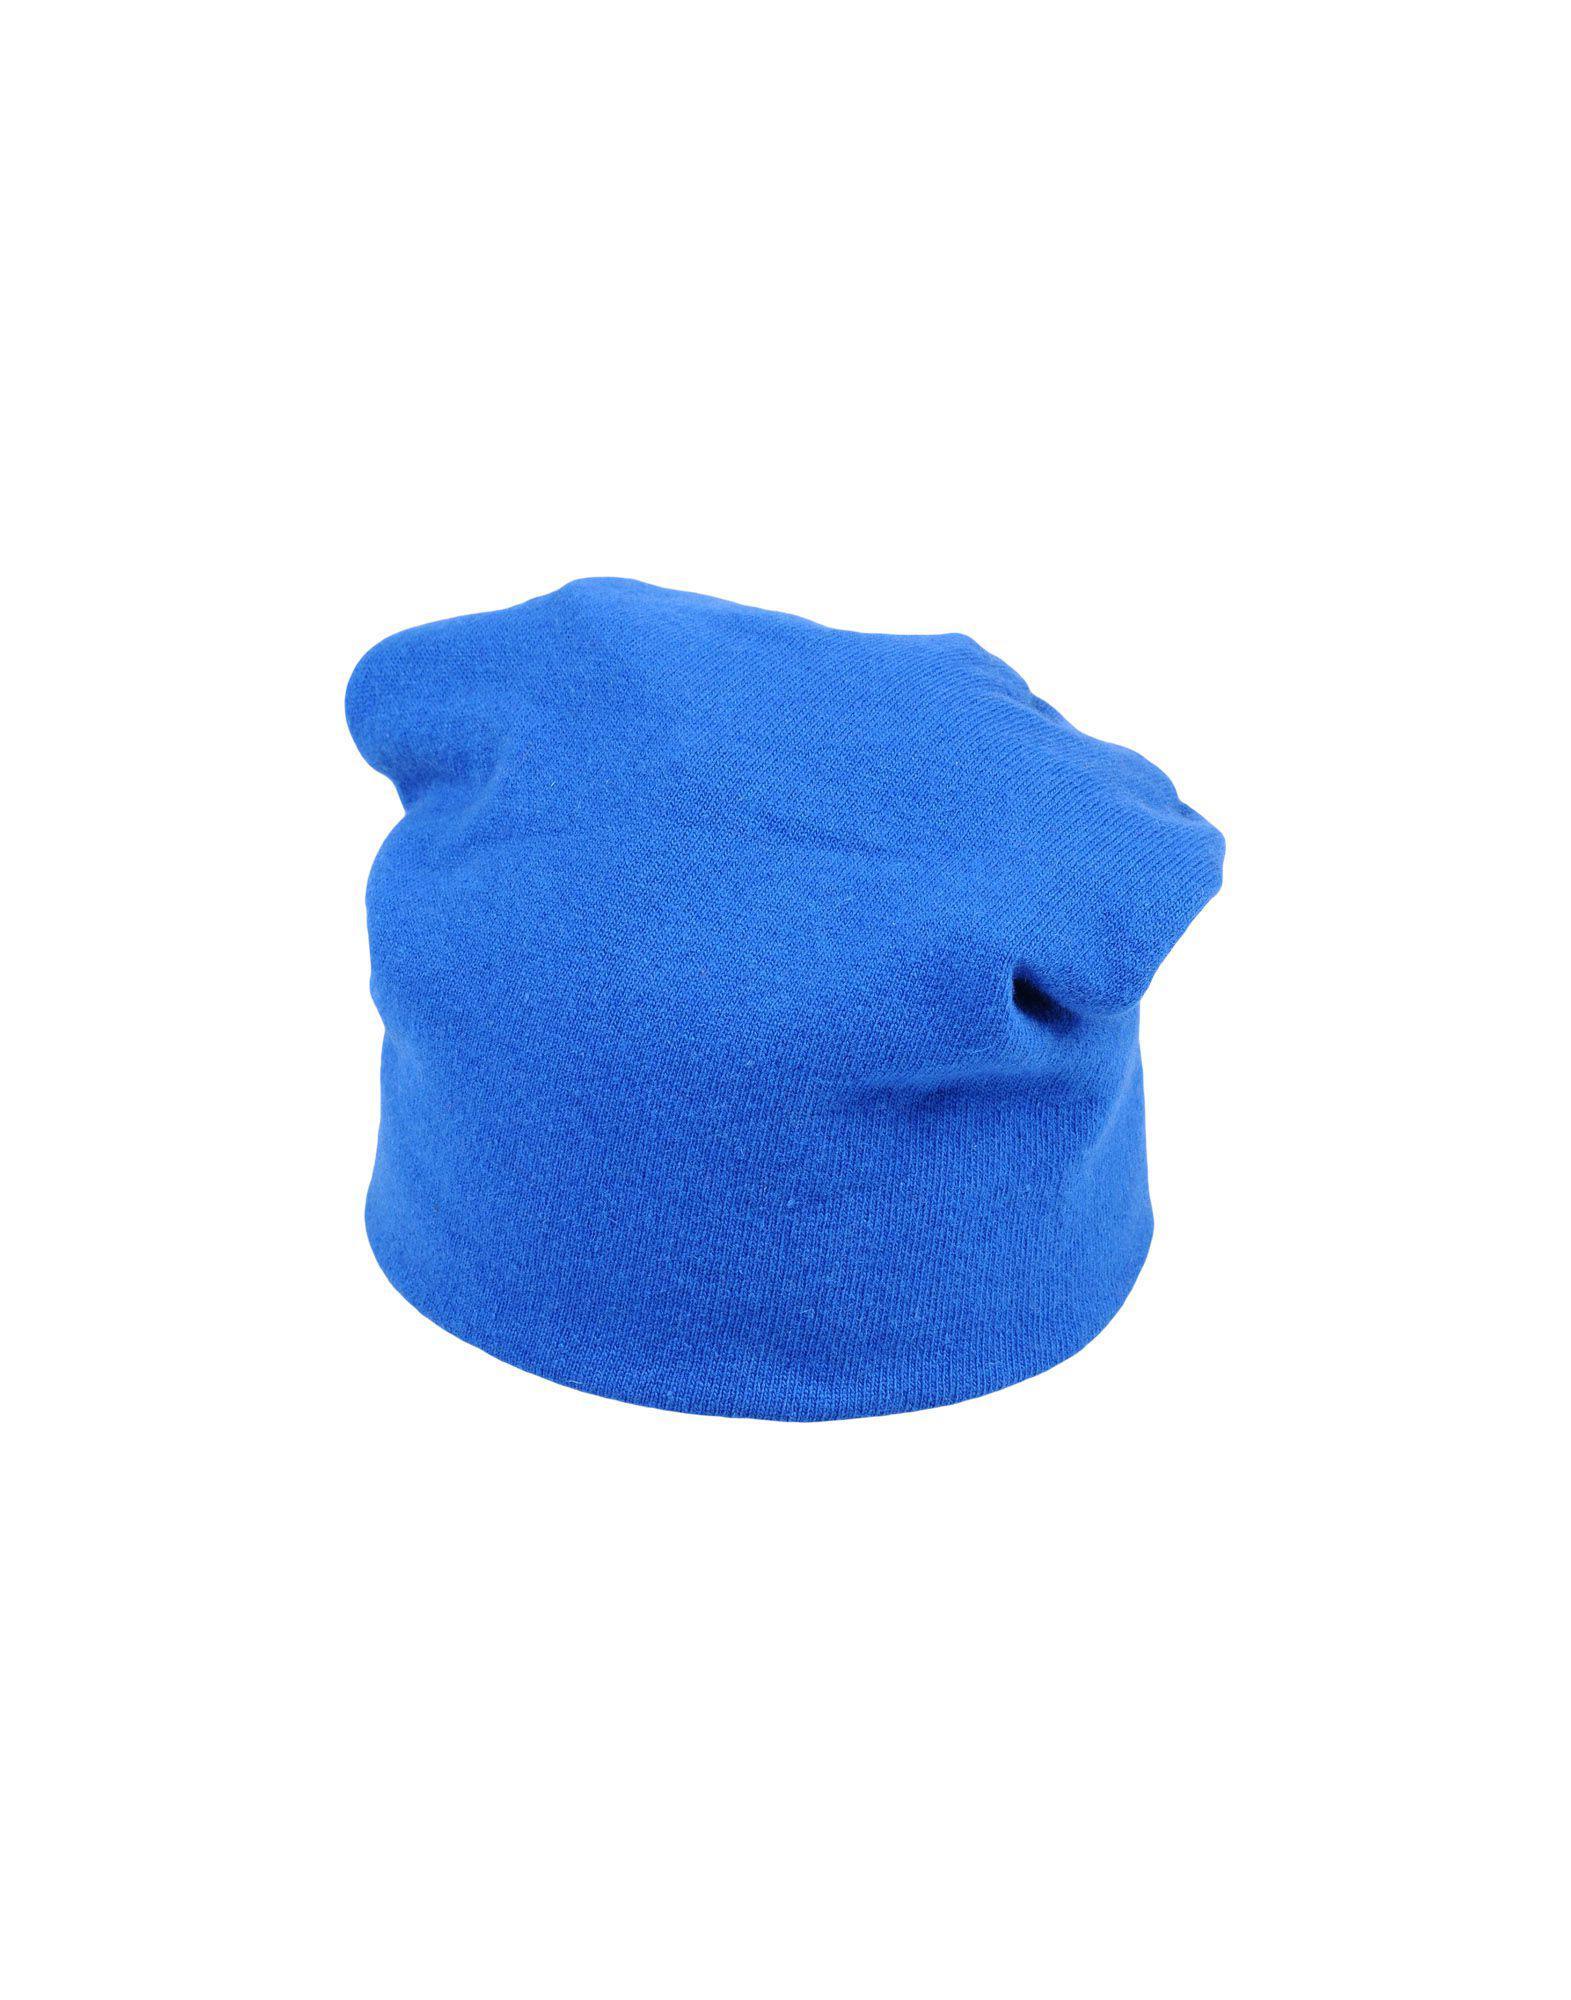 ACCESSORIES - Hats Jucca 9ctR5k93Qr